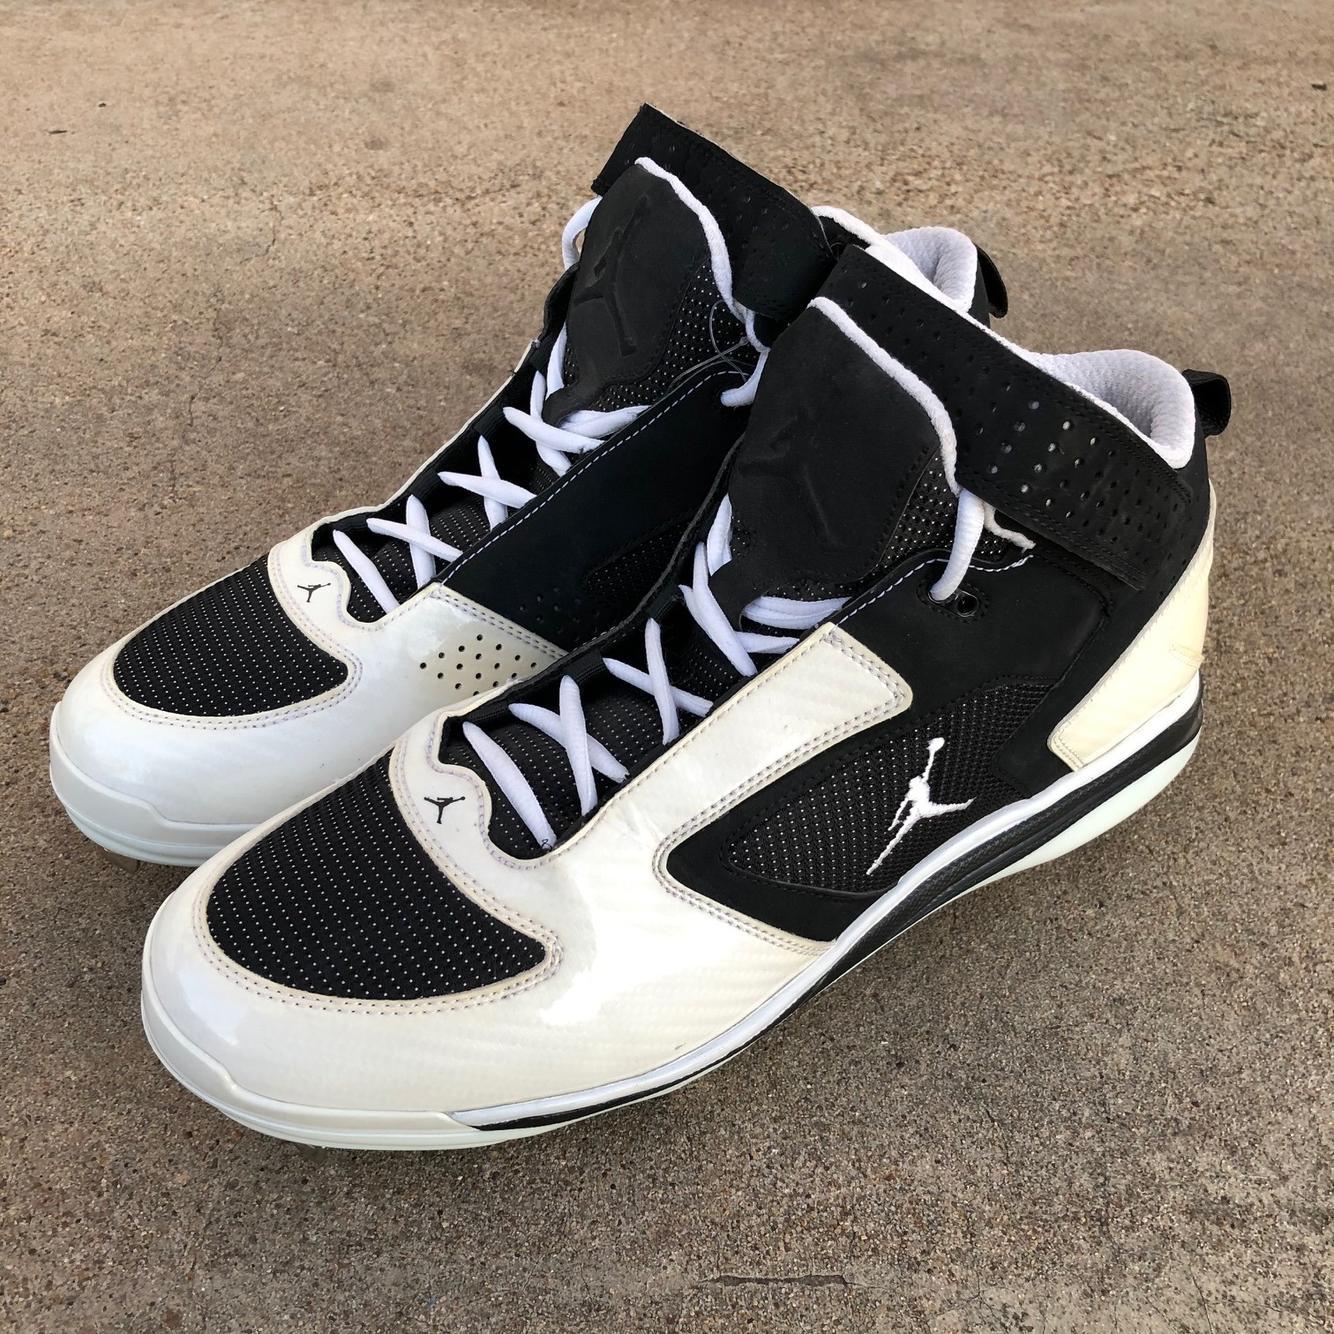 Jordan Jeter Diamond Cat Cleats sz 12